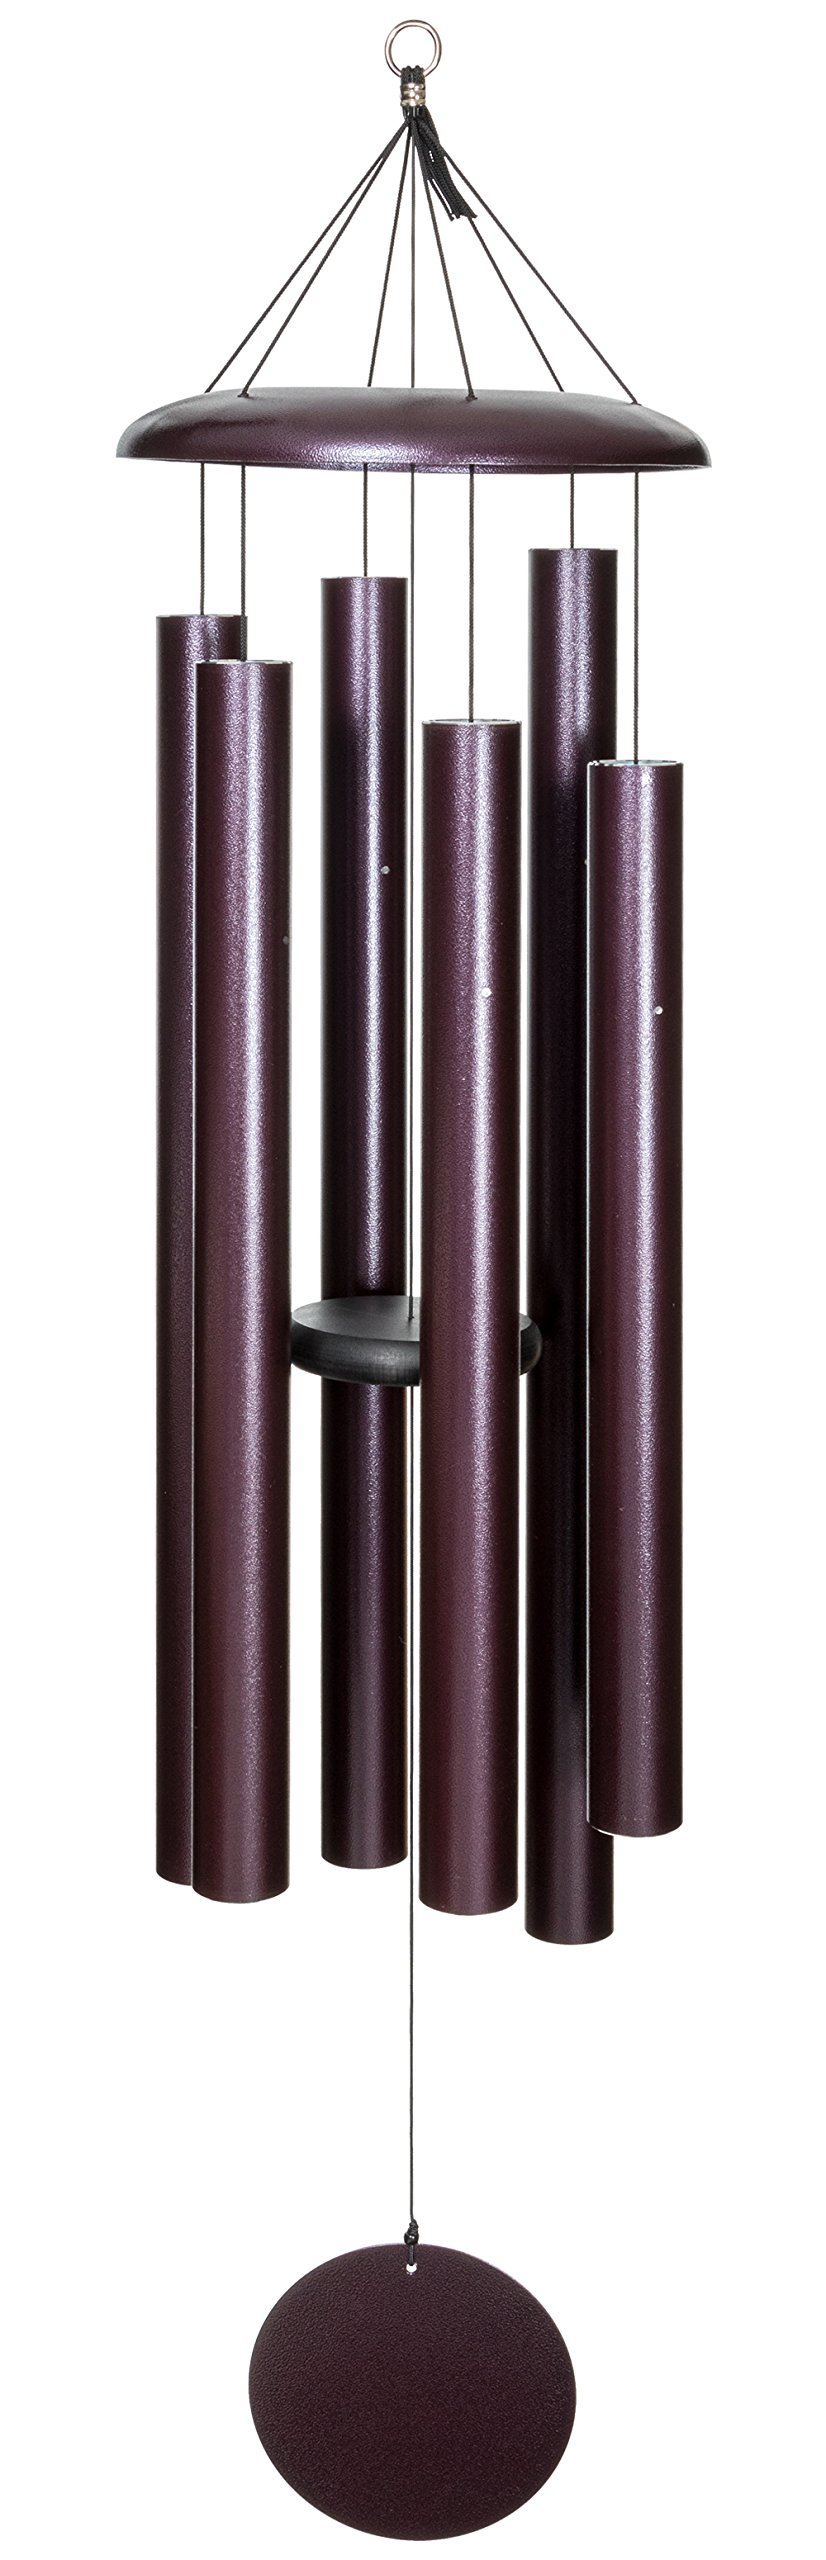 Corinthian Bells 55-inch Windchime, Plum